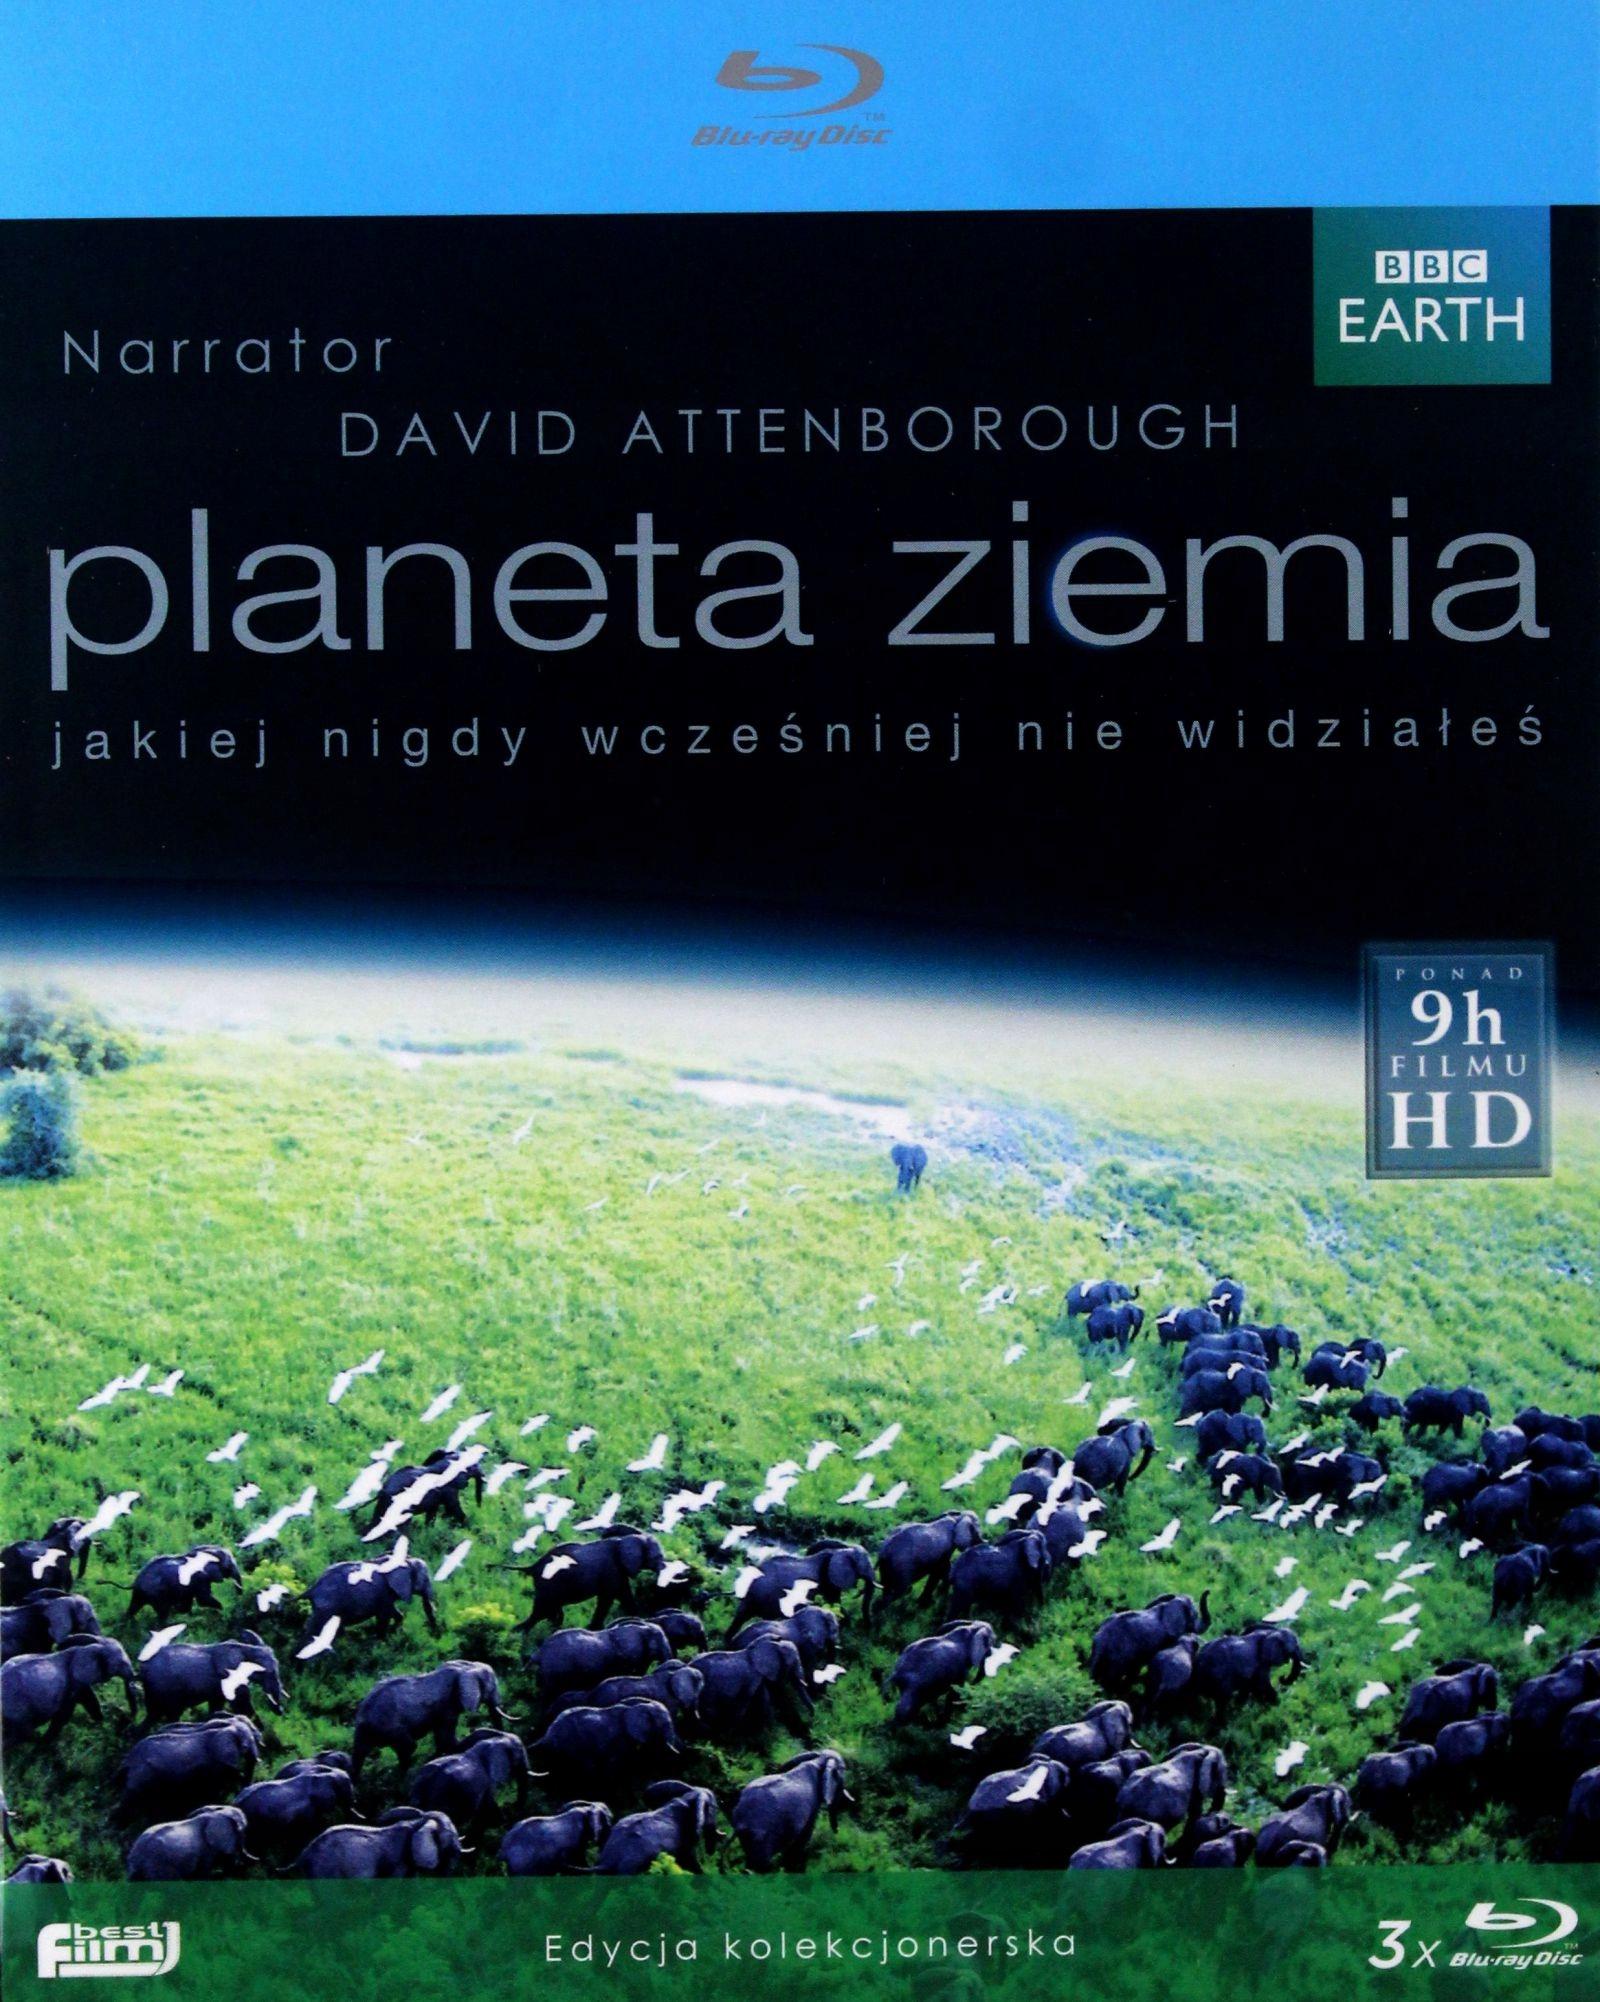 PLANETA ZIEMIA (BBC) BOX [3XBLU-RAY]